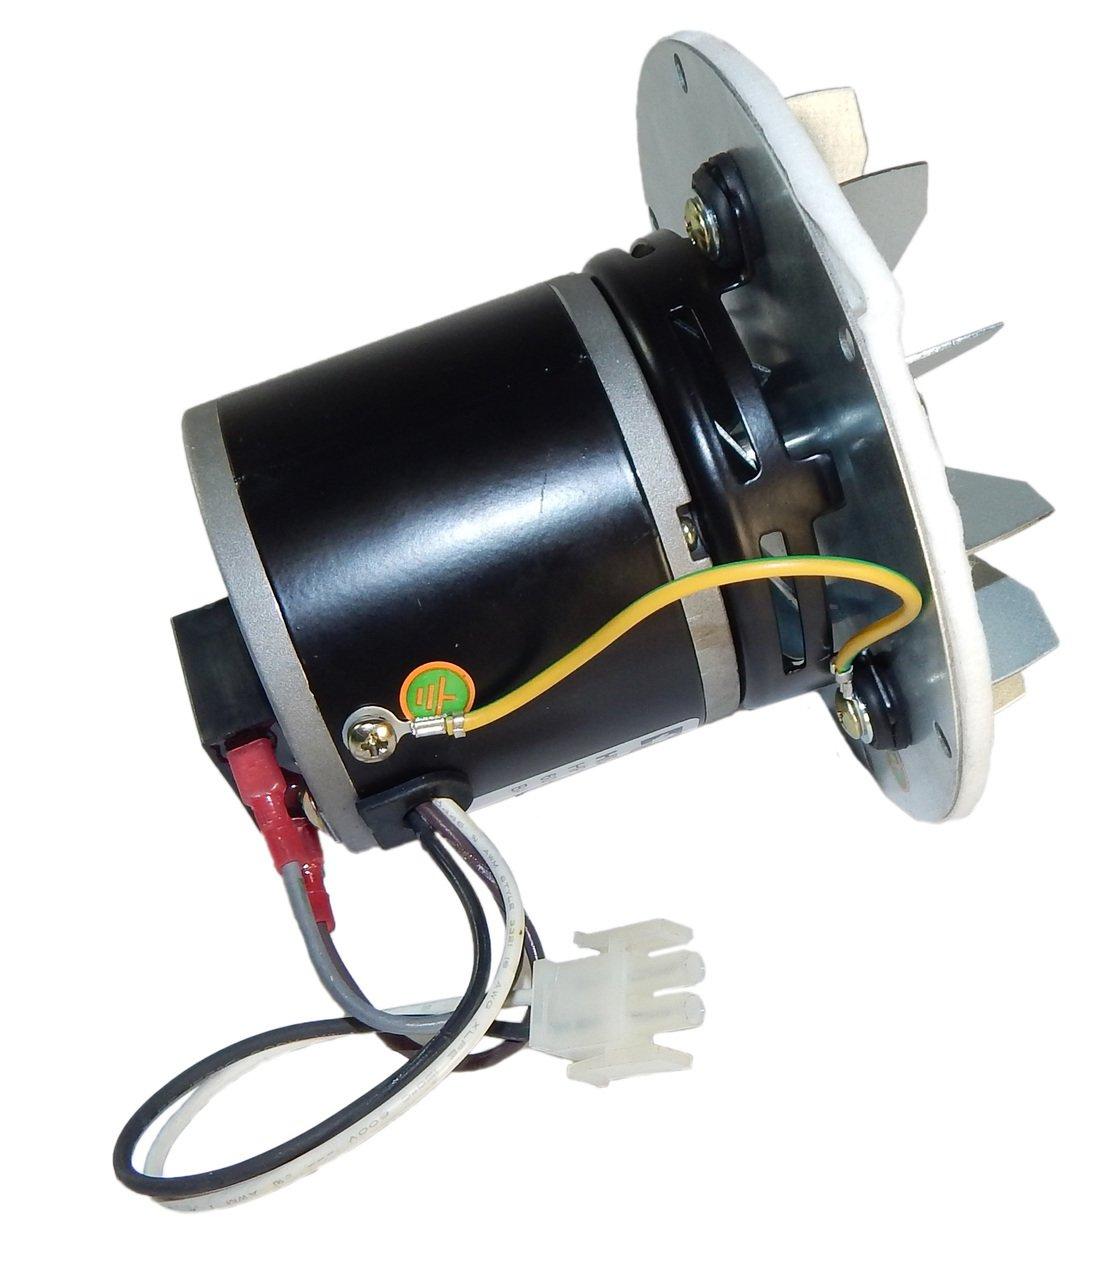 Pellet Stove Blower Motor, 1/14hp, 3000RPM, 0.6 amps. 115 Volt ...